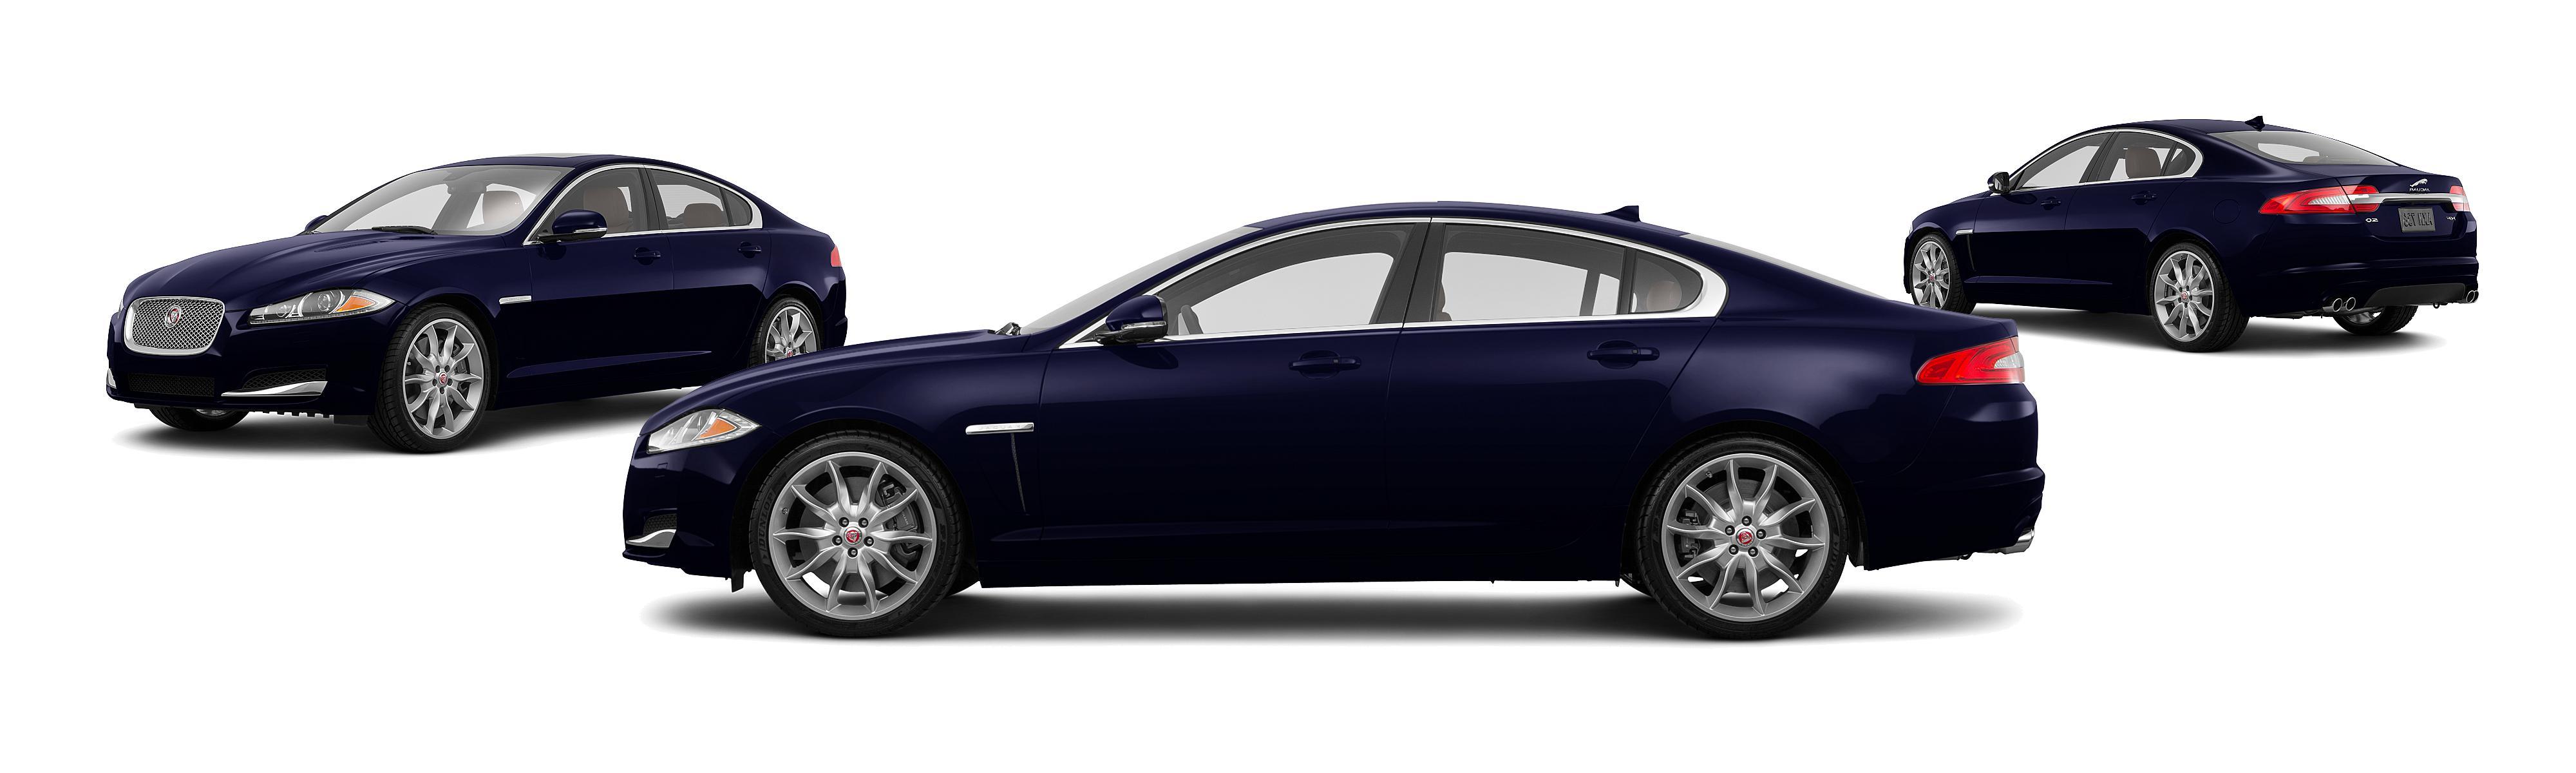 sedan jaguar carfinder silver copart on in auto colorado title en sale springs xf lot auctions superch co view left salvage online